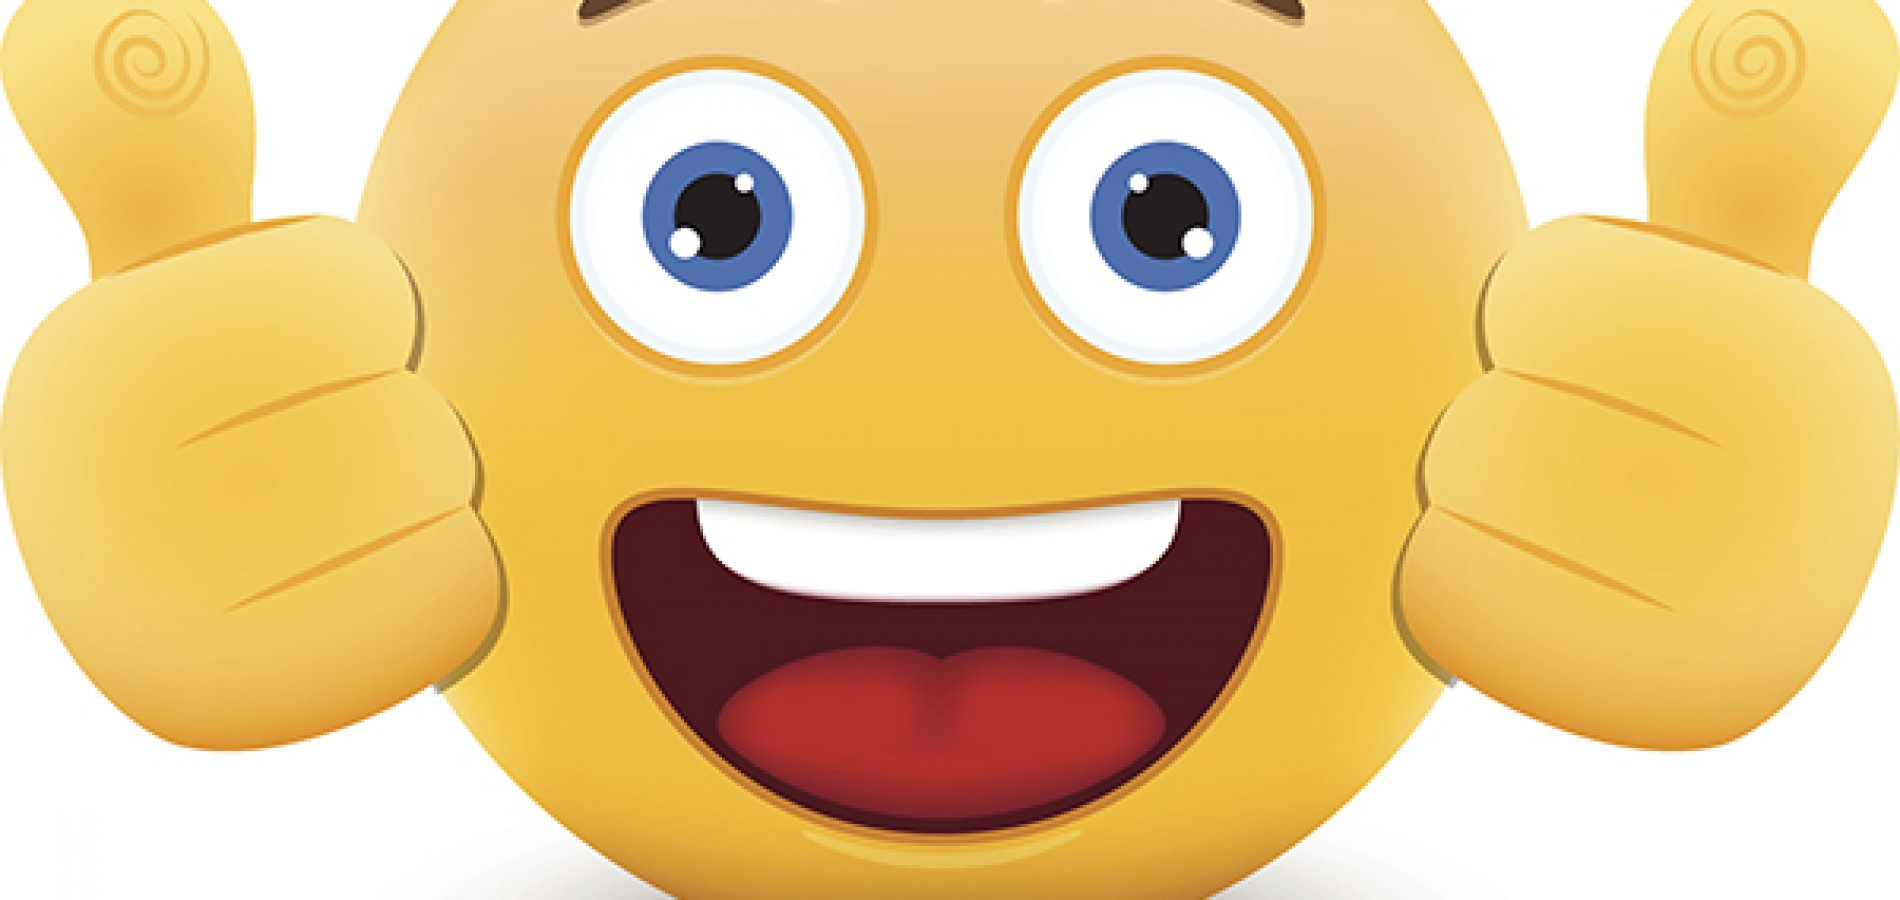 sony vai transformar emojis em desenho animadosony vai transformar